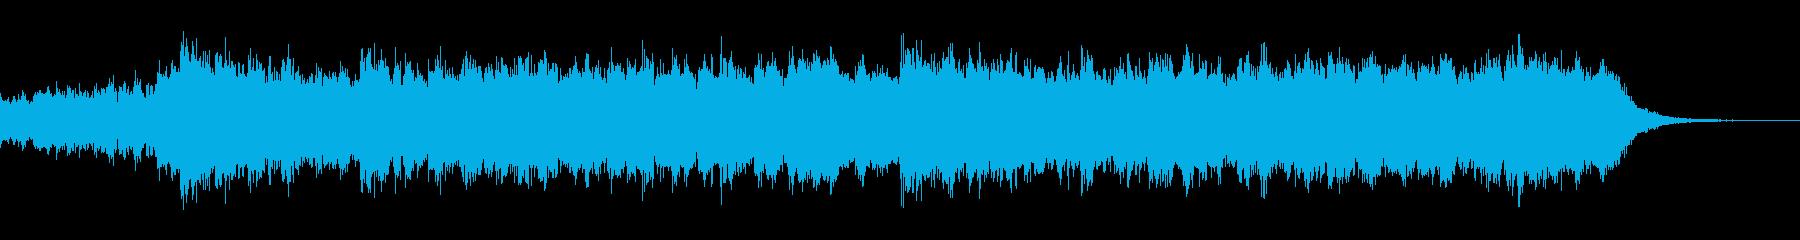 YAMATO_30secの再生済みの波形